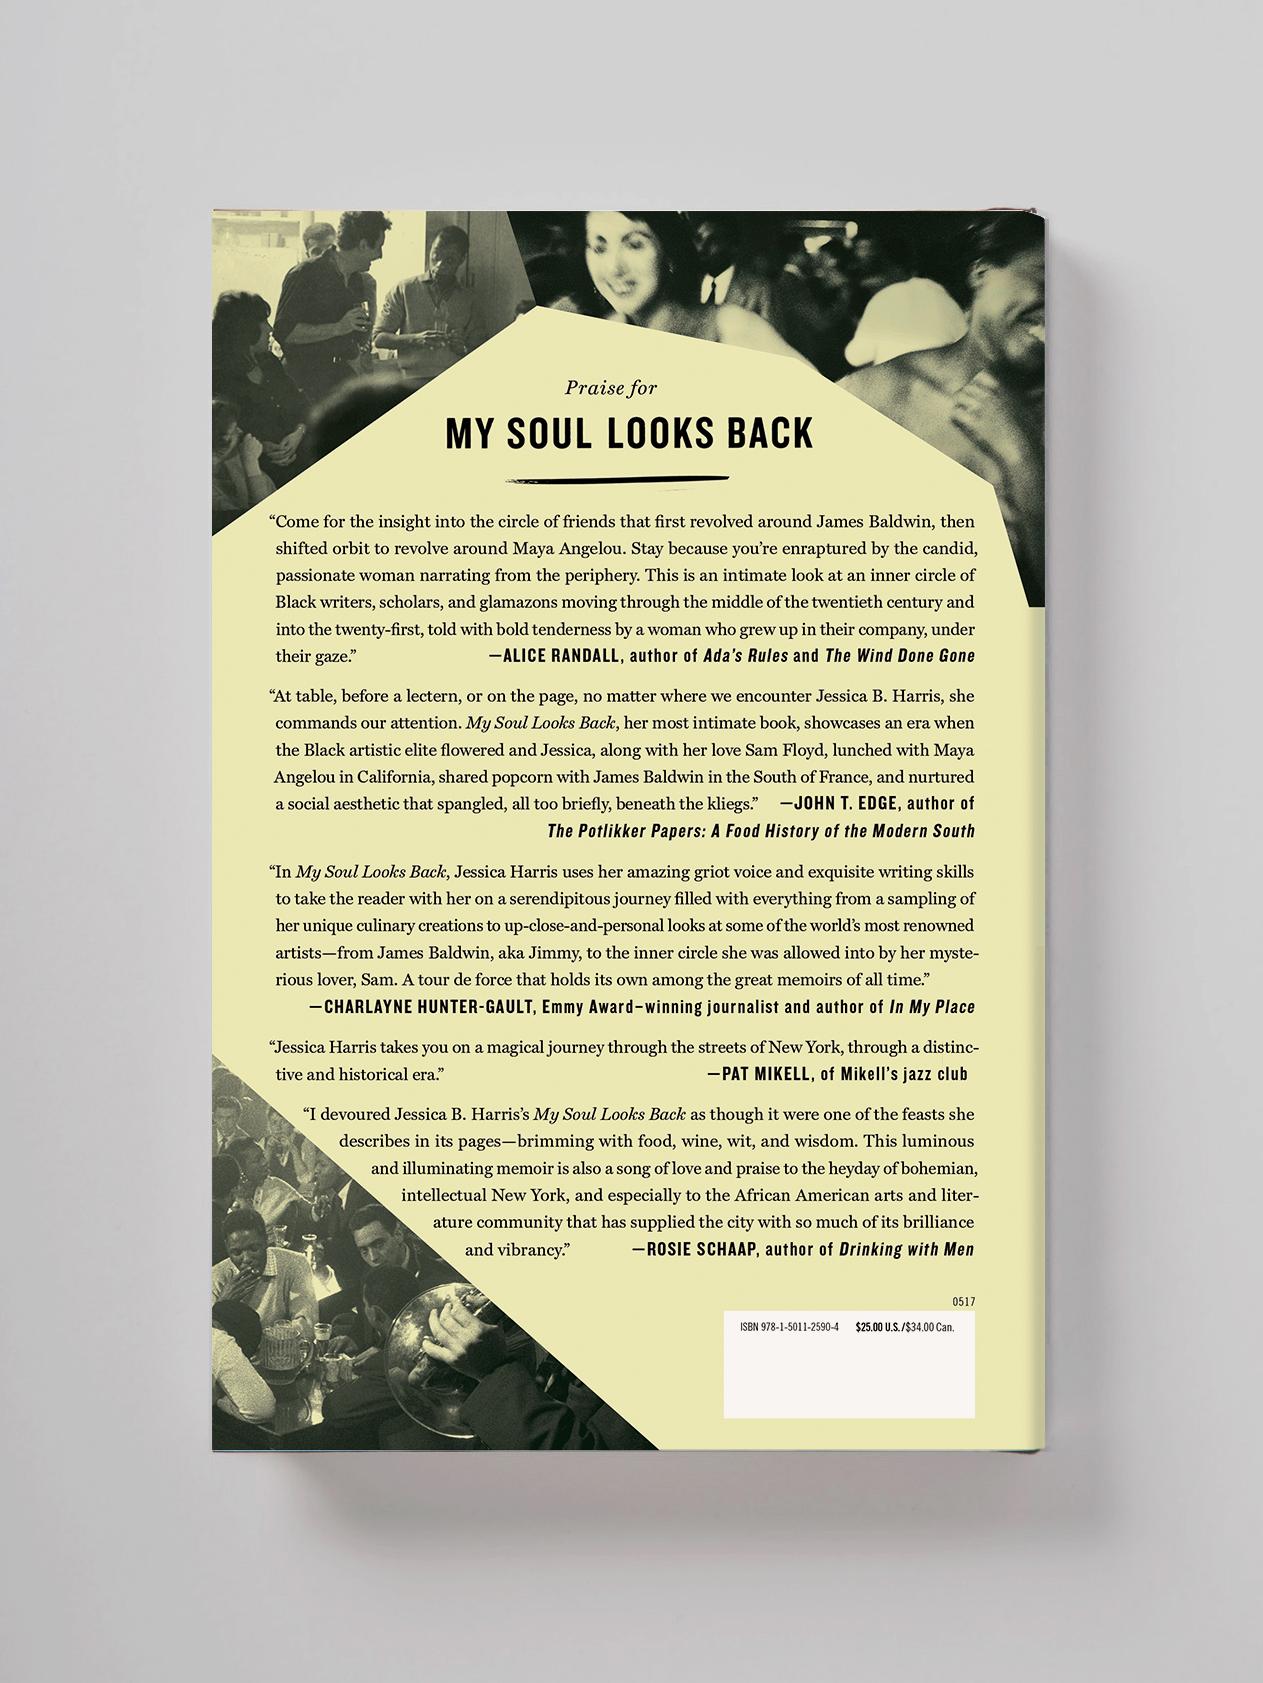 My Soul Looks Back verso—Jessica B. Harris